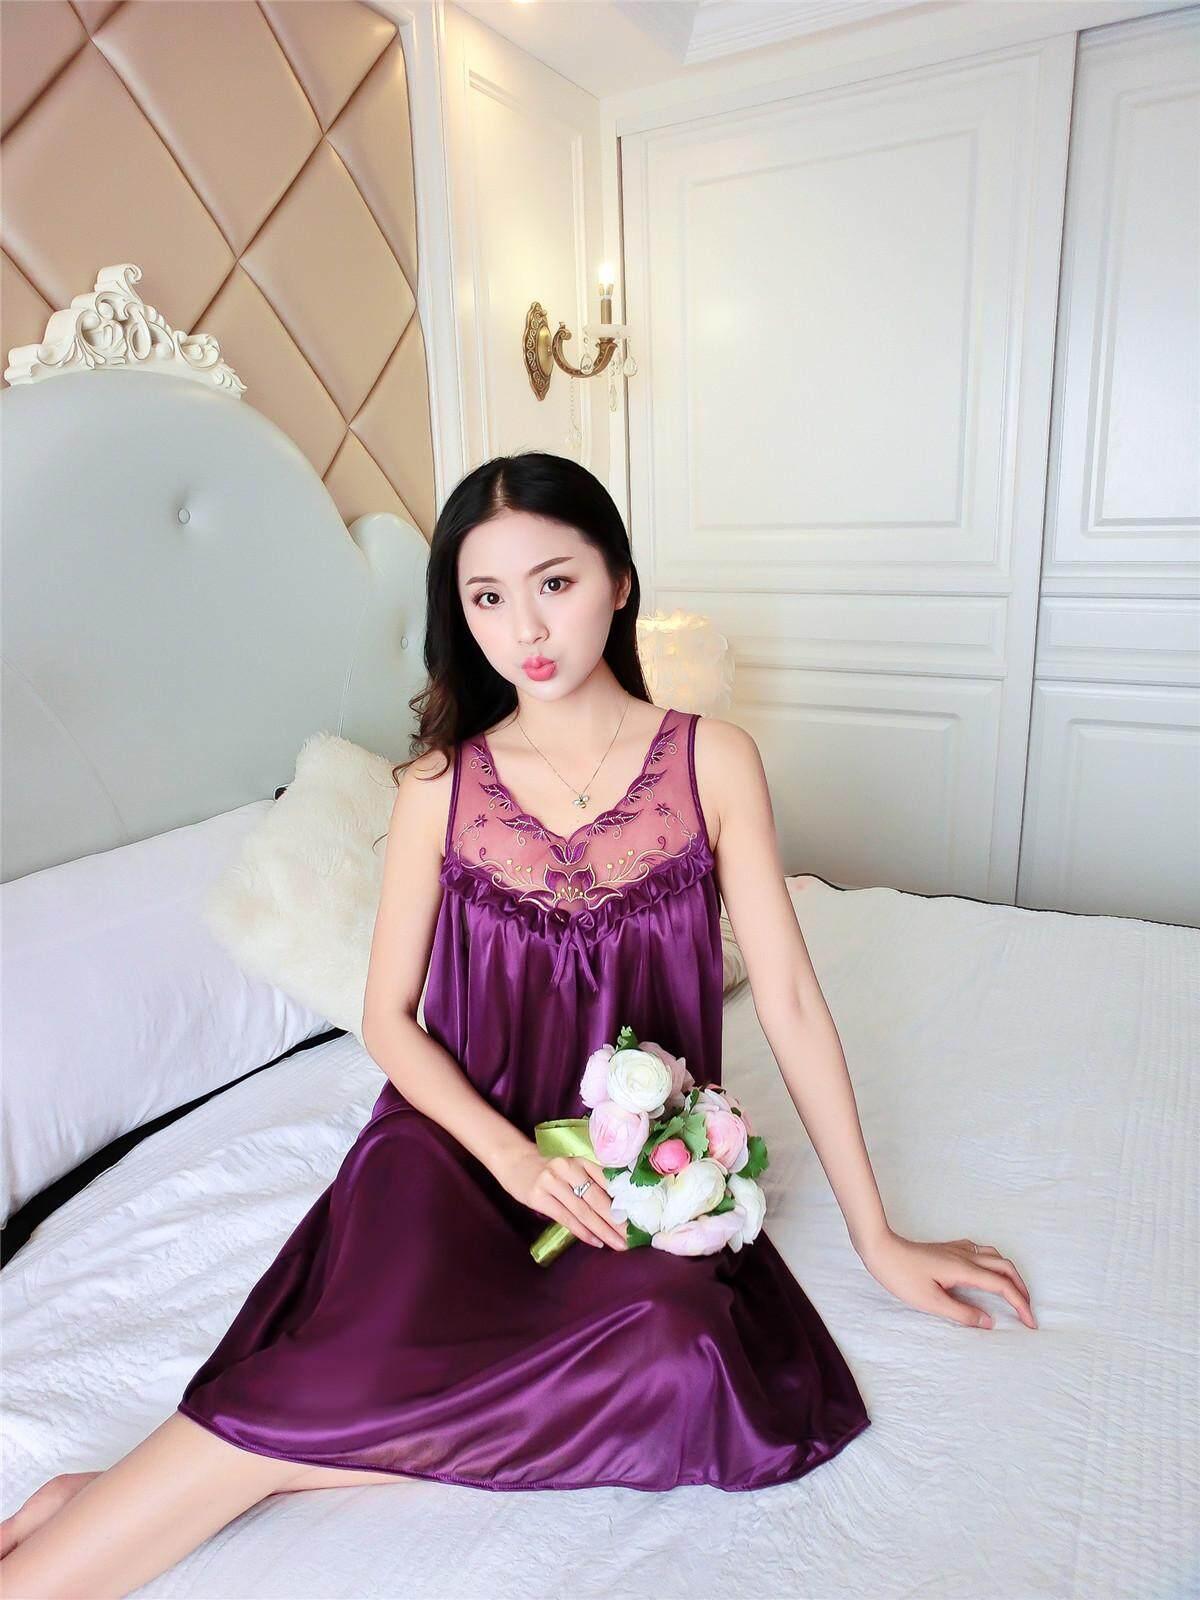 Bolster Store Ladies Women Sexy lingerie Sleepwear Short Sleeve Bow Ribbon Lace Pajamas Long Dress Silk Comfortable Night Wear Pyjamas